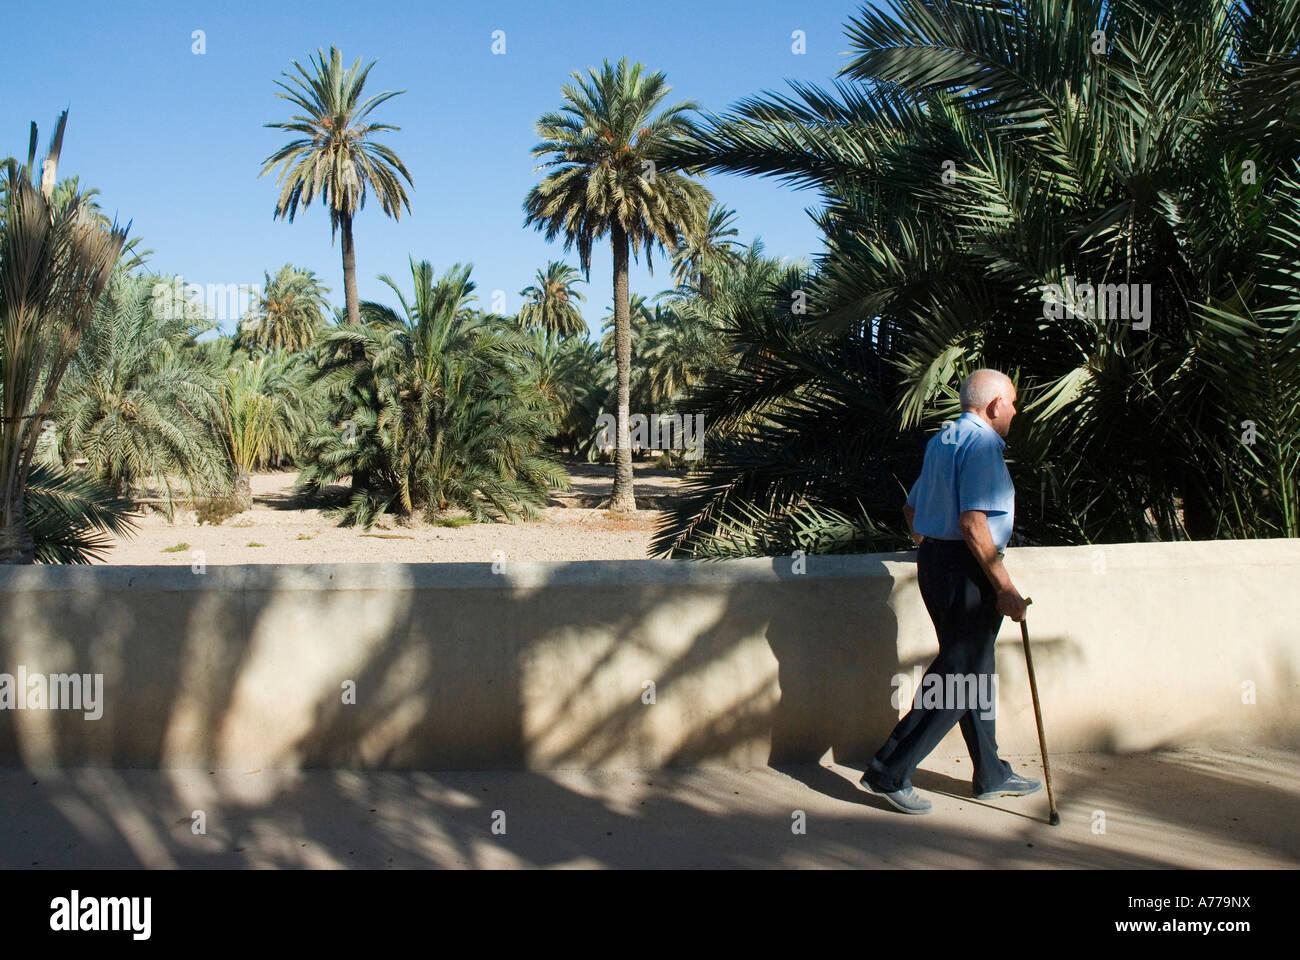 Almassera path in The Elx Palm Grove / ELCHE / Spain - Stock Image